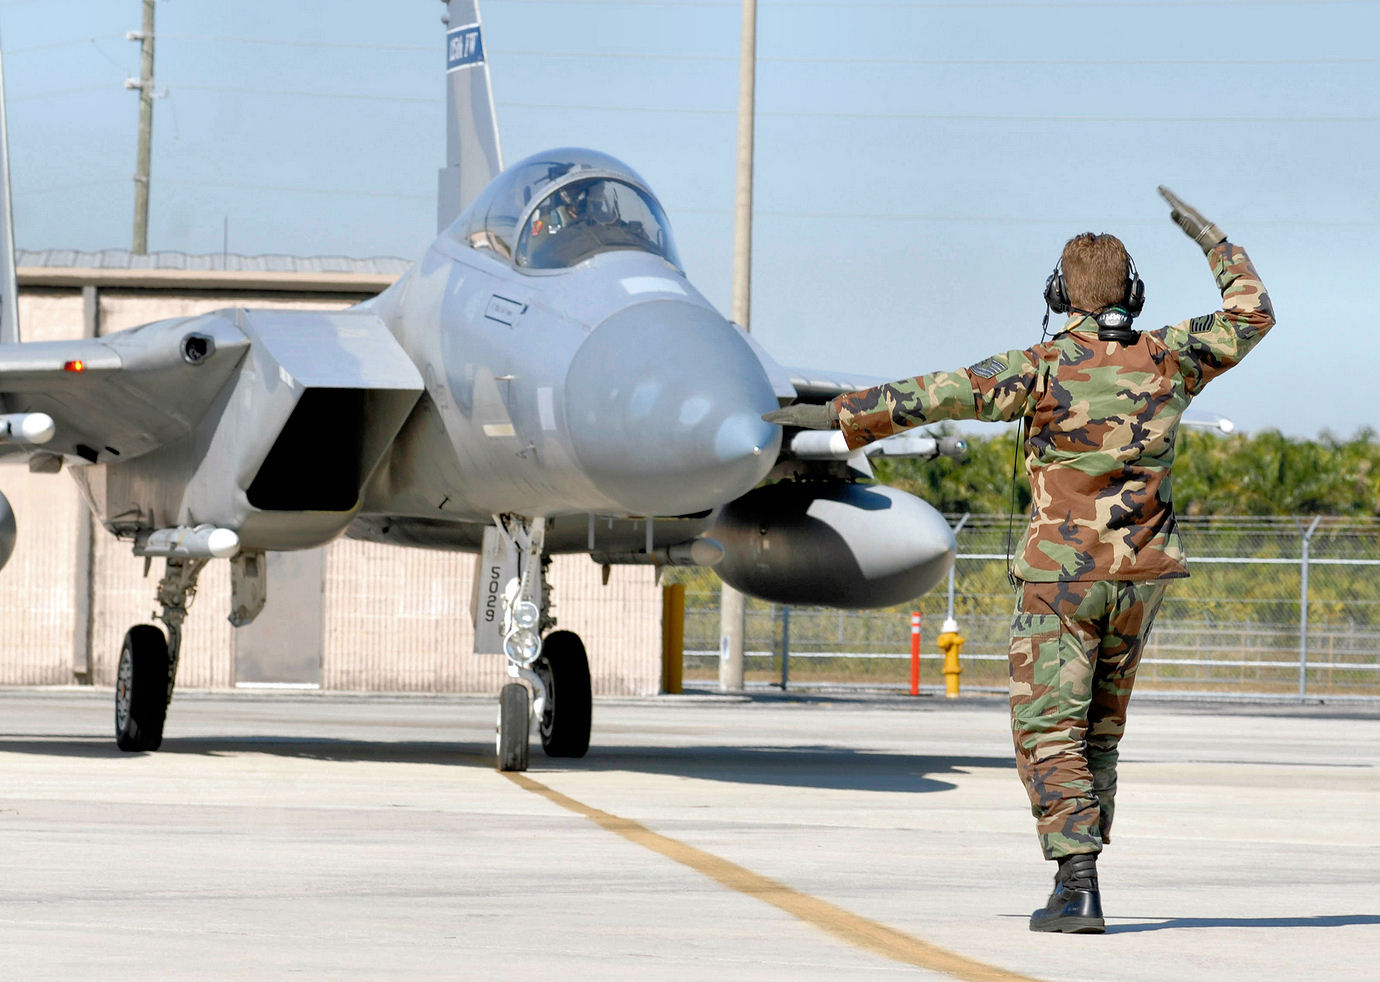 125th_Fighter_Wing_-_McDonnell_Douglas_F-15A-13-MC_Eagle_75-029